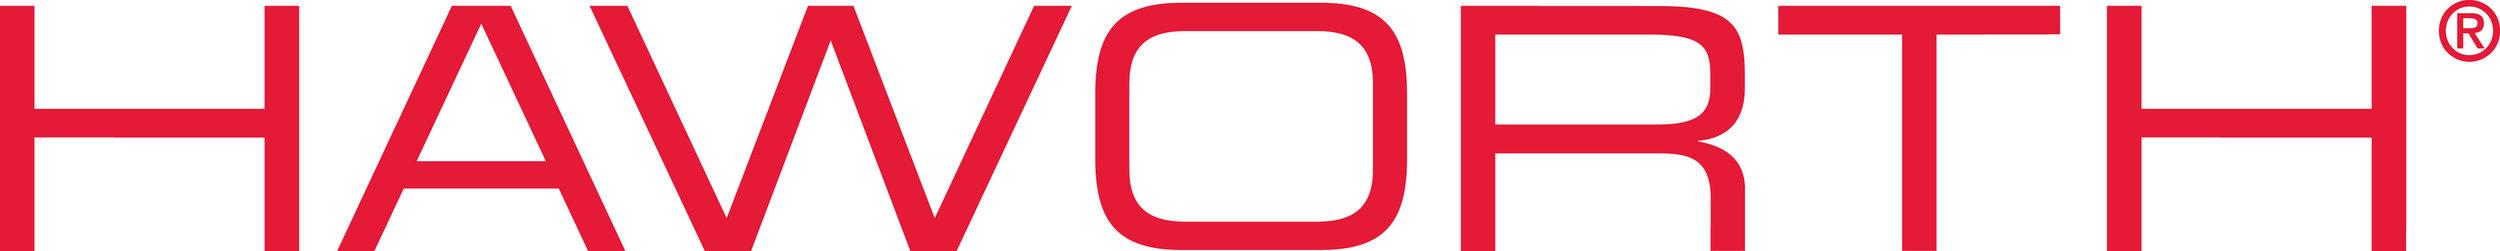 Haworth-Logo_Red_Large.jpg